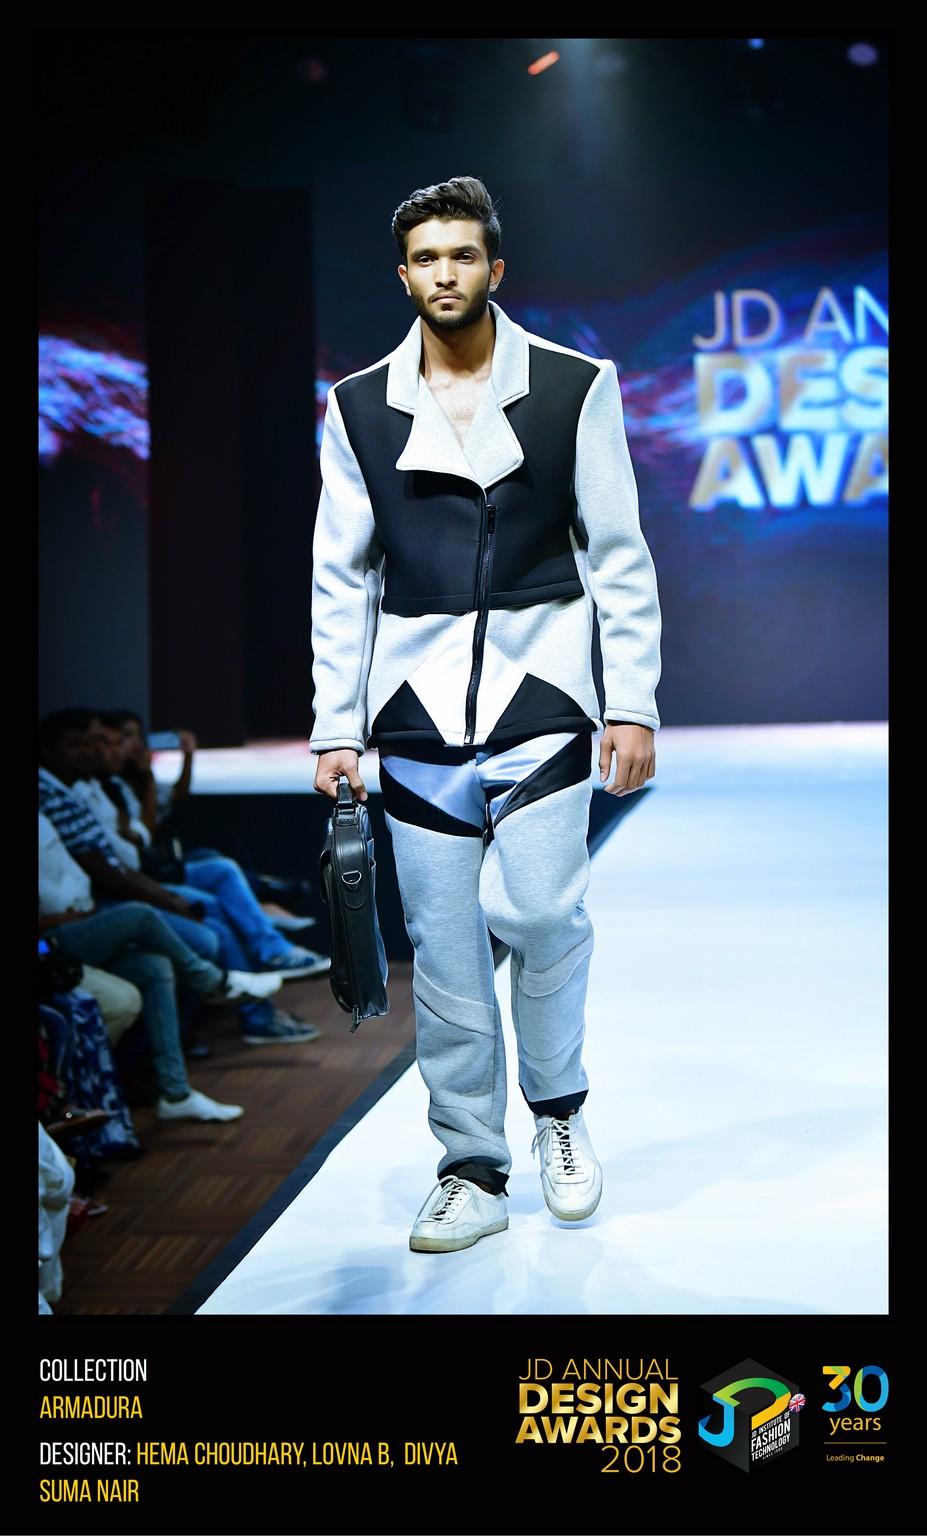 Armadura Collection – Change – JD Annual Design Awards 2018   Designer: Hema, Lovna, Divya   Photography : Jerin Nath (@jerin_nath) armadura collection - ARMADURA1 - Armadura Collection – Change – JD Annual Design Awards 2018